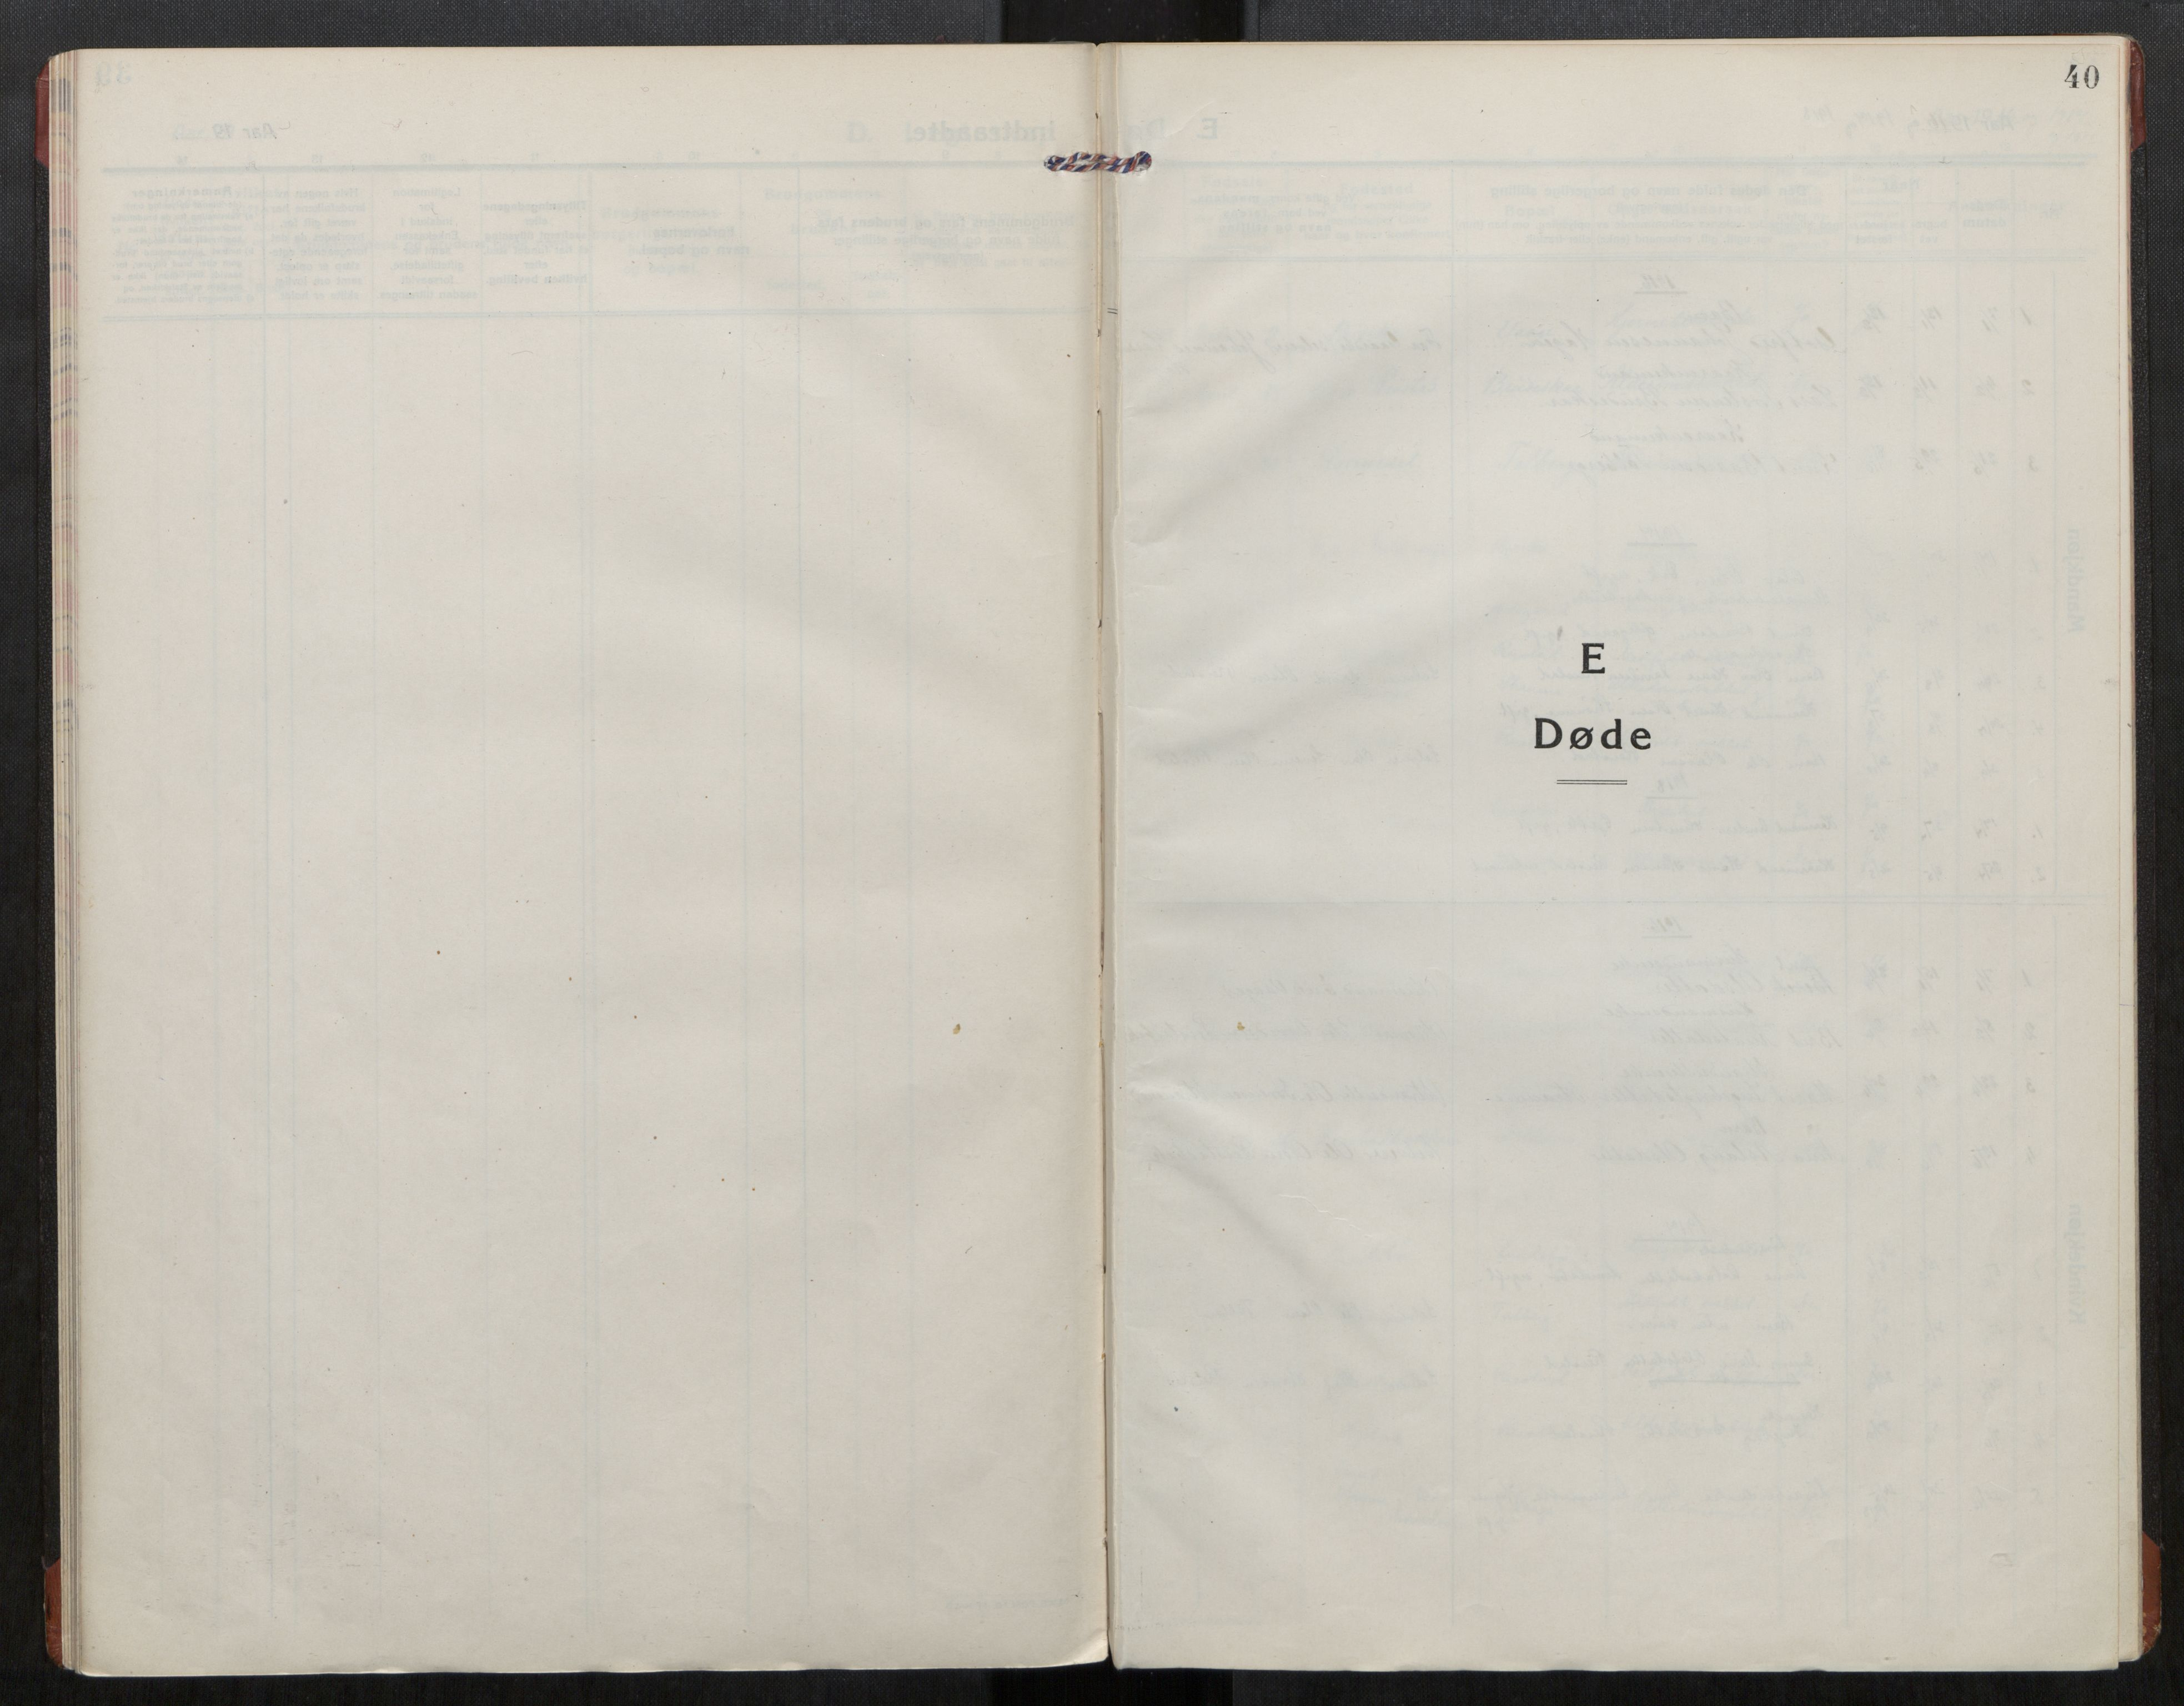 SAT, Grytten sokneprestkontor, Ministerialbok nr. 550A02, 1916-1931, s. 40